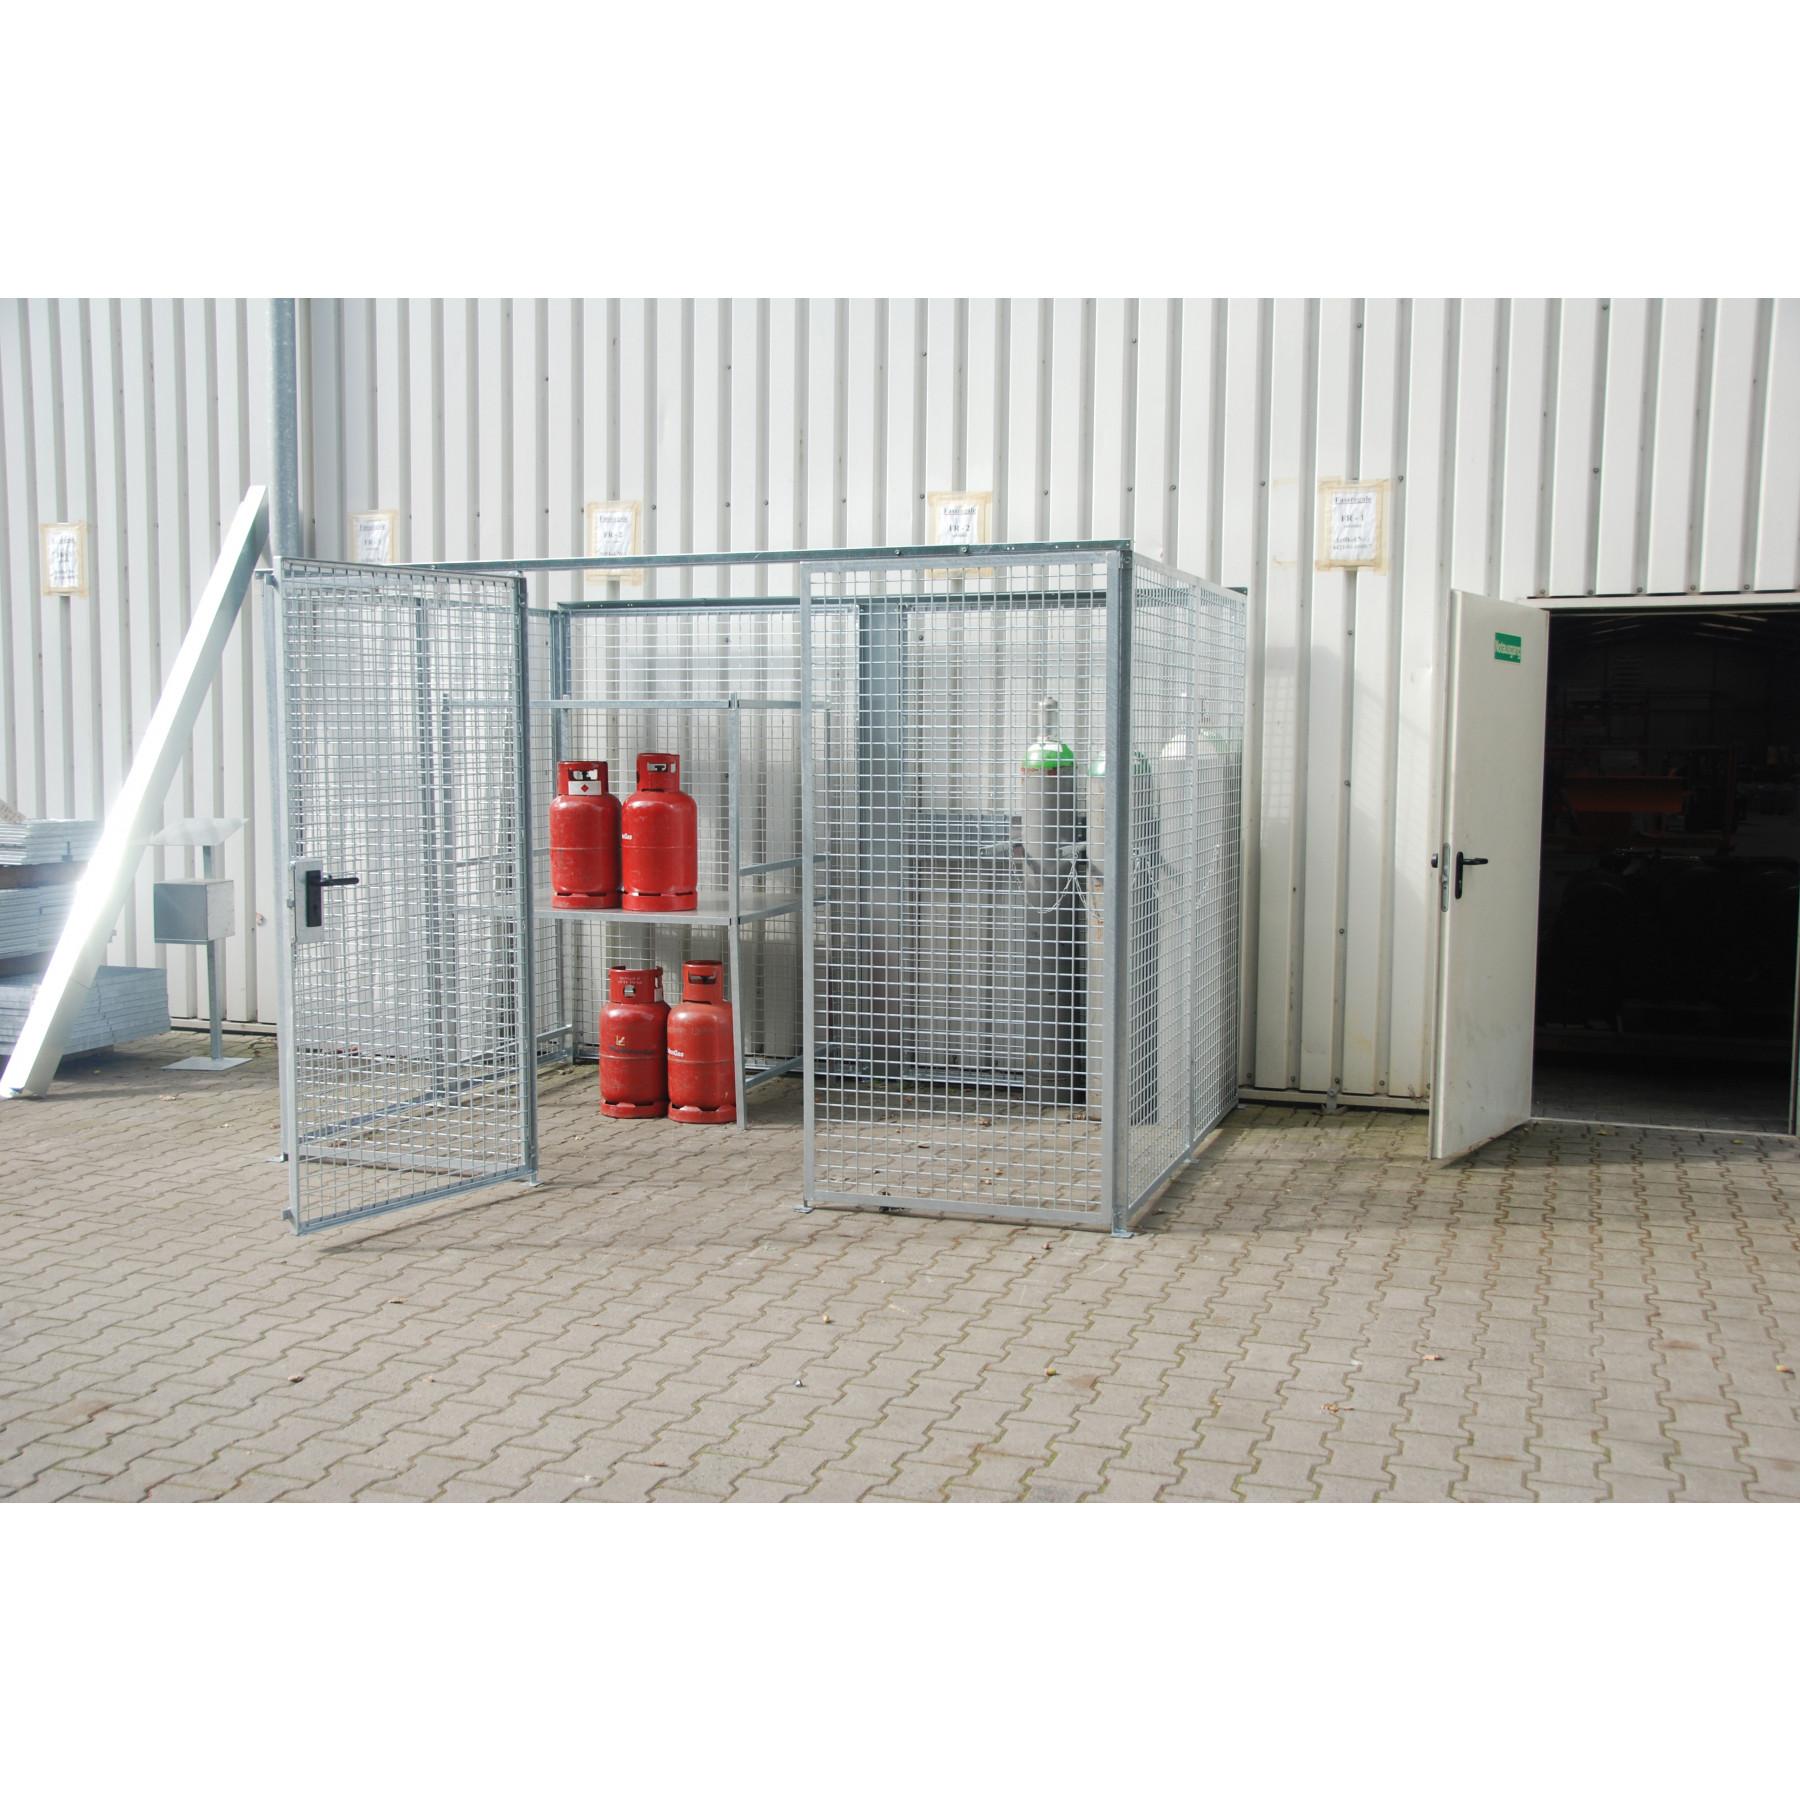 Gasflessencontainer zonder dak voor 32 gasflessen, GFC-M1